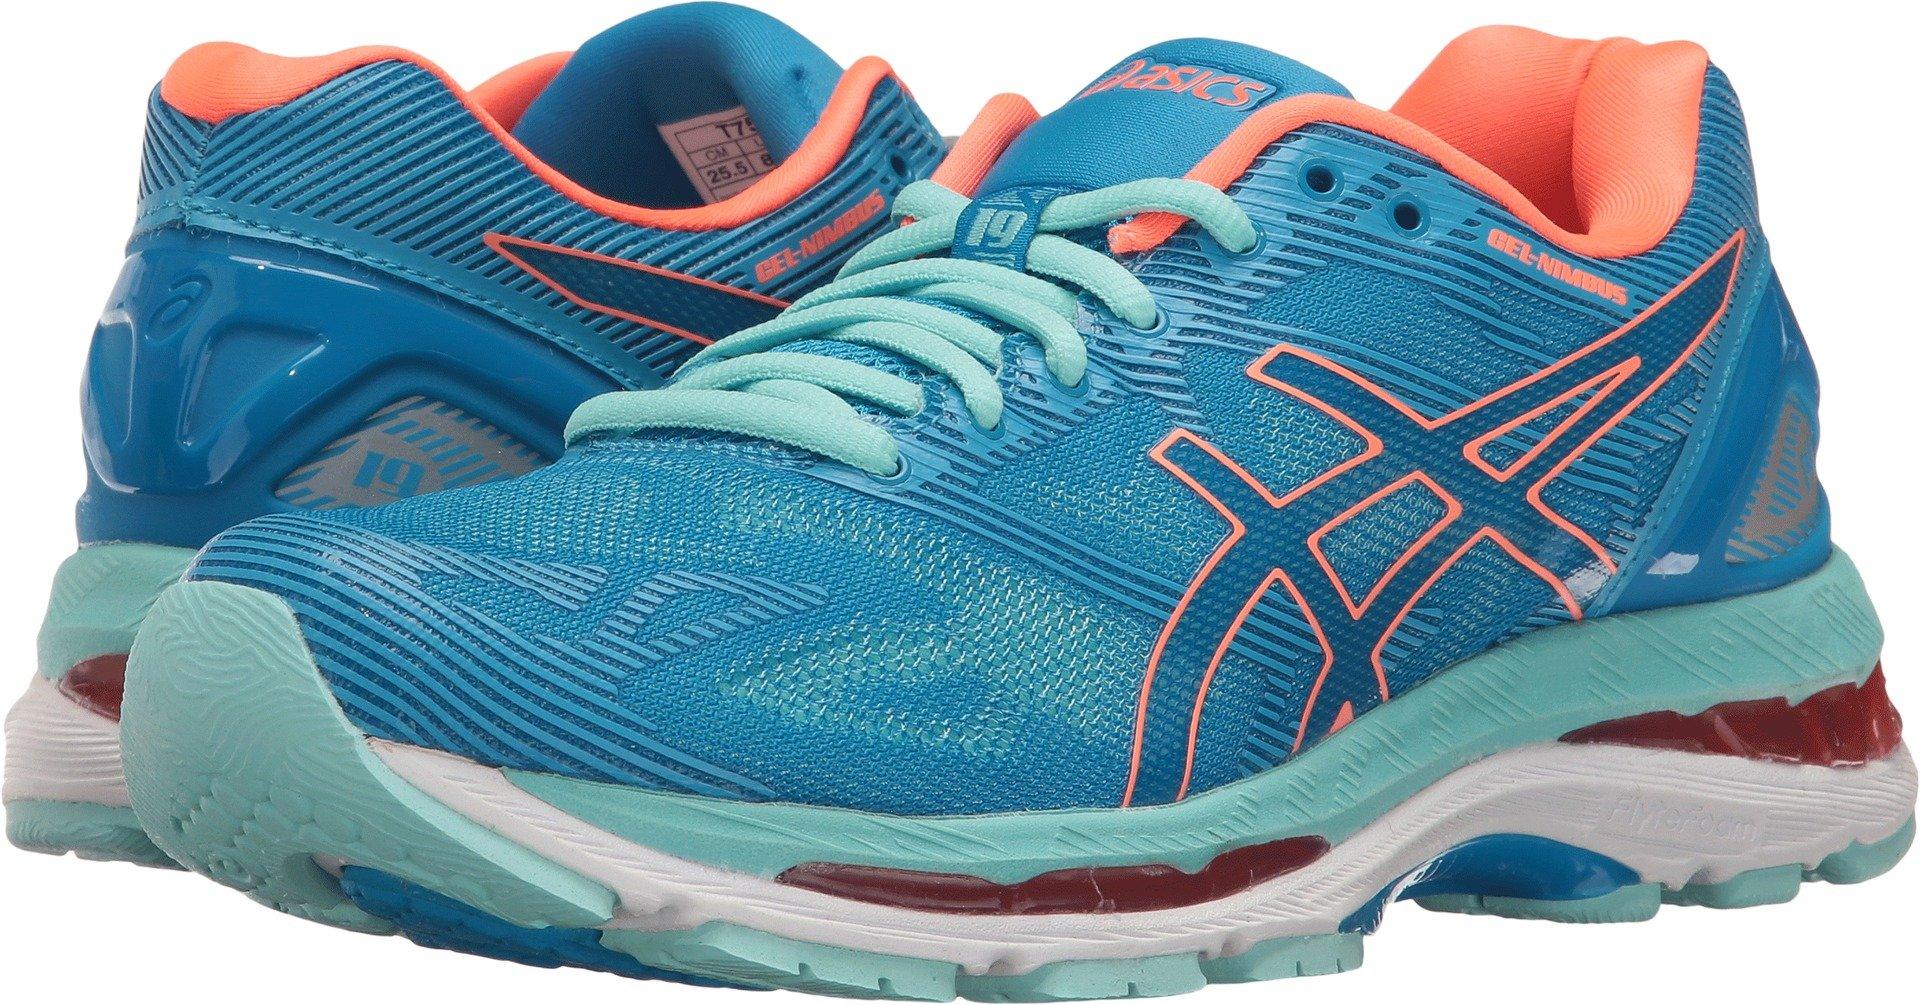 ASICS Women's Gel-Nimbus 19 Running Shoe, Diva Blue/Flash Coral/Aqua Splash, 8.5 M US